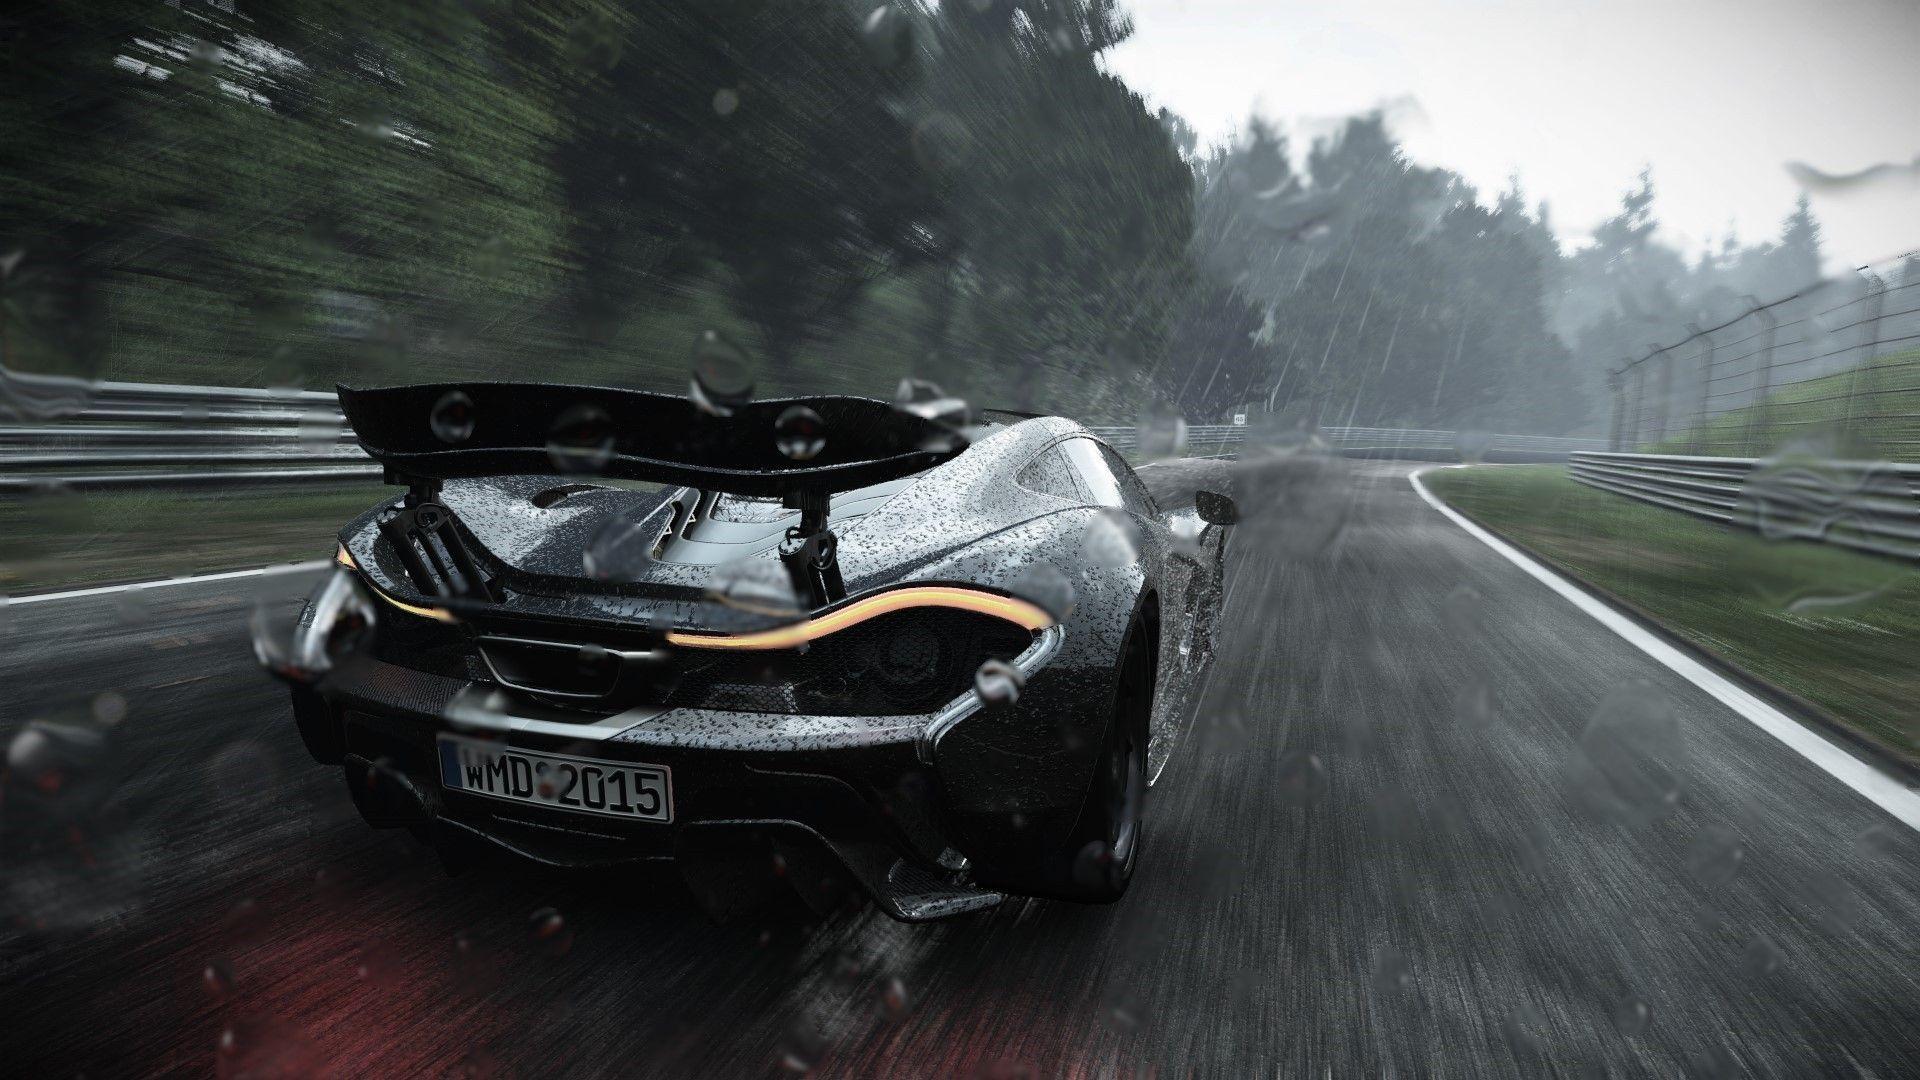 Car Rain Wallpapers - Top Free Car Rain Backgrounds ...